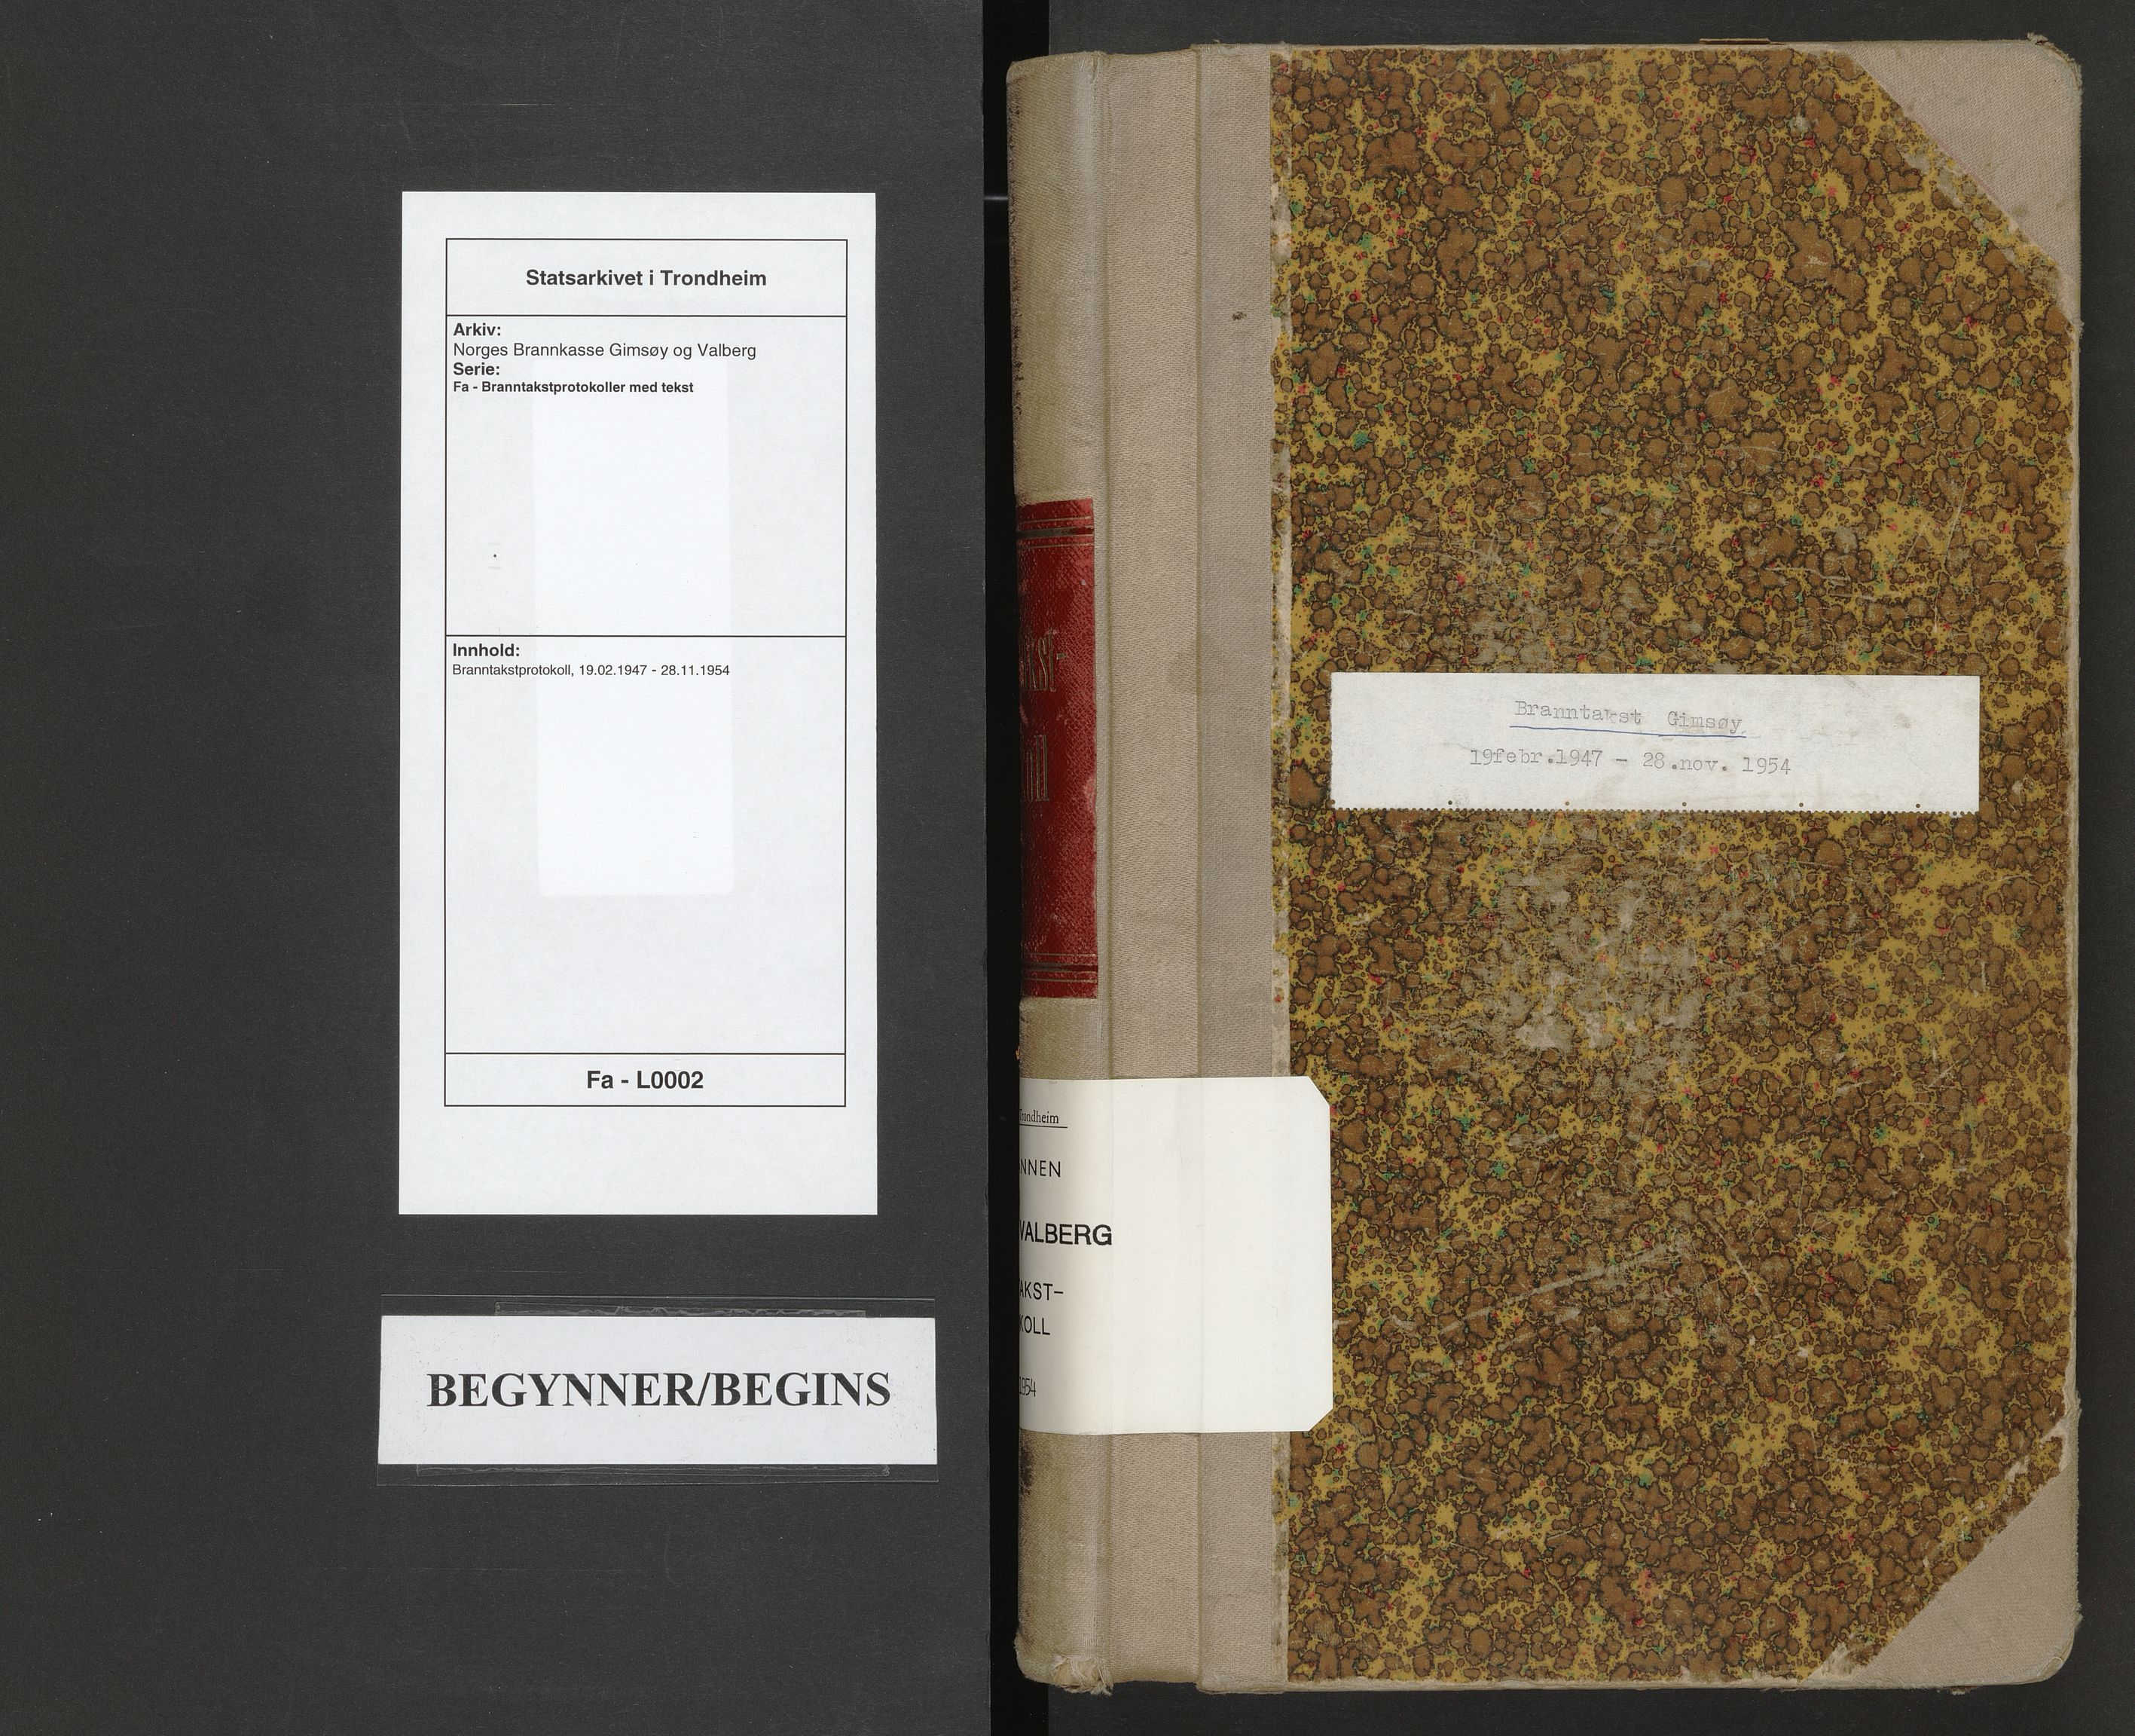 SAT, Norges Brannkasse Gimsøy og Valberg, Fa/L0002: Branntakstprotokoll, 1947-1954